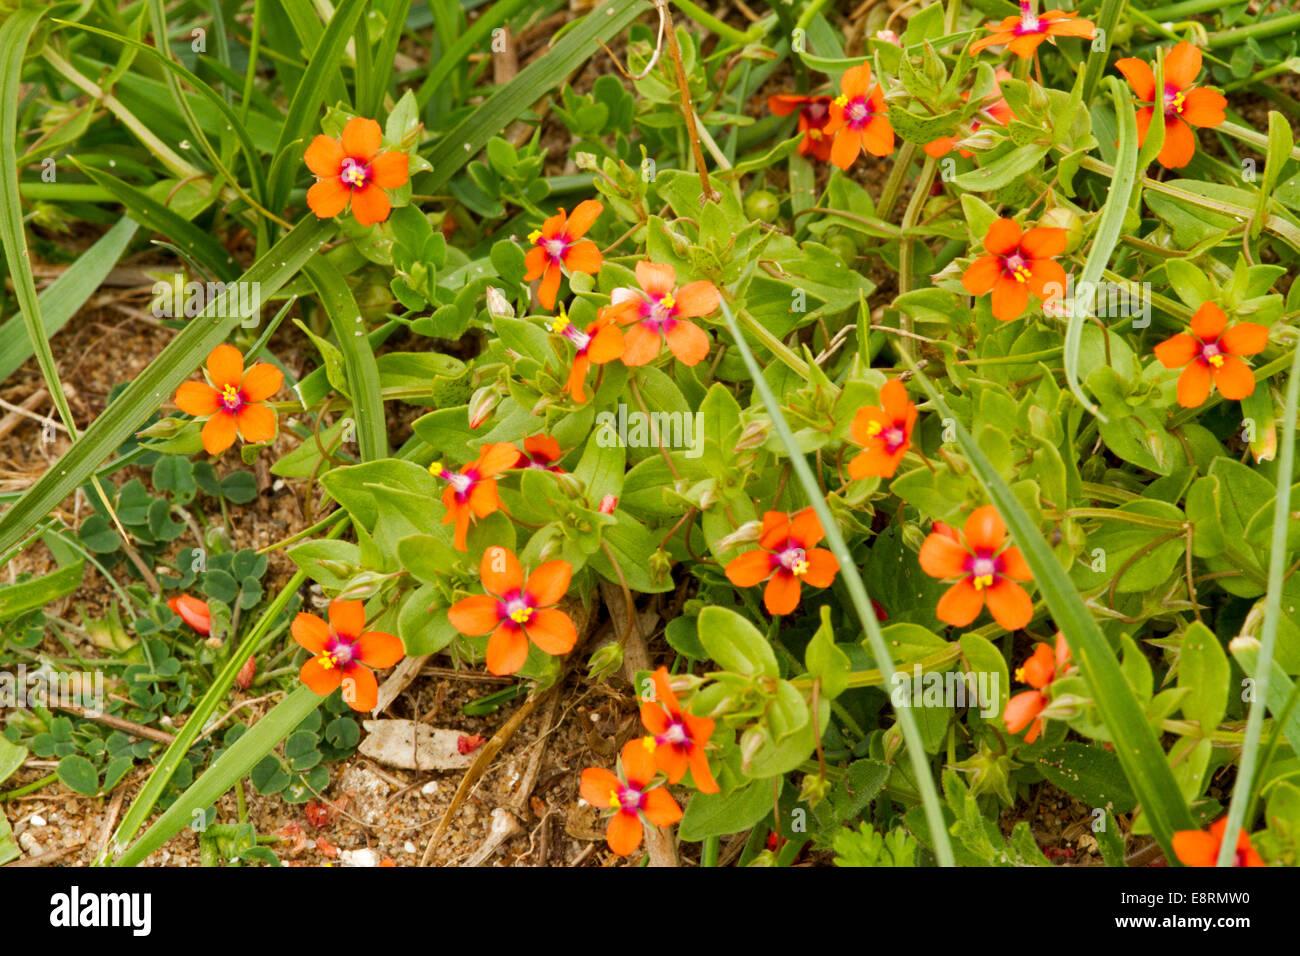 British Wildflowers Cluster Of Tiny Bright Red Orange